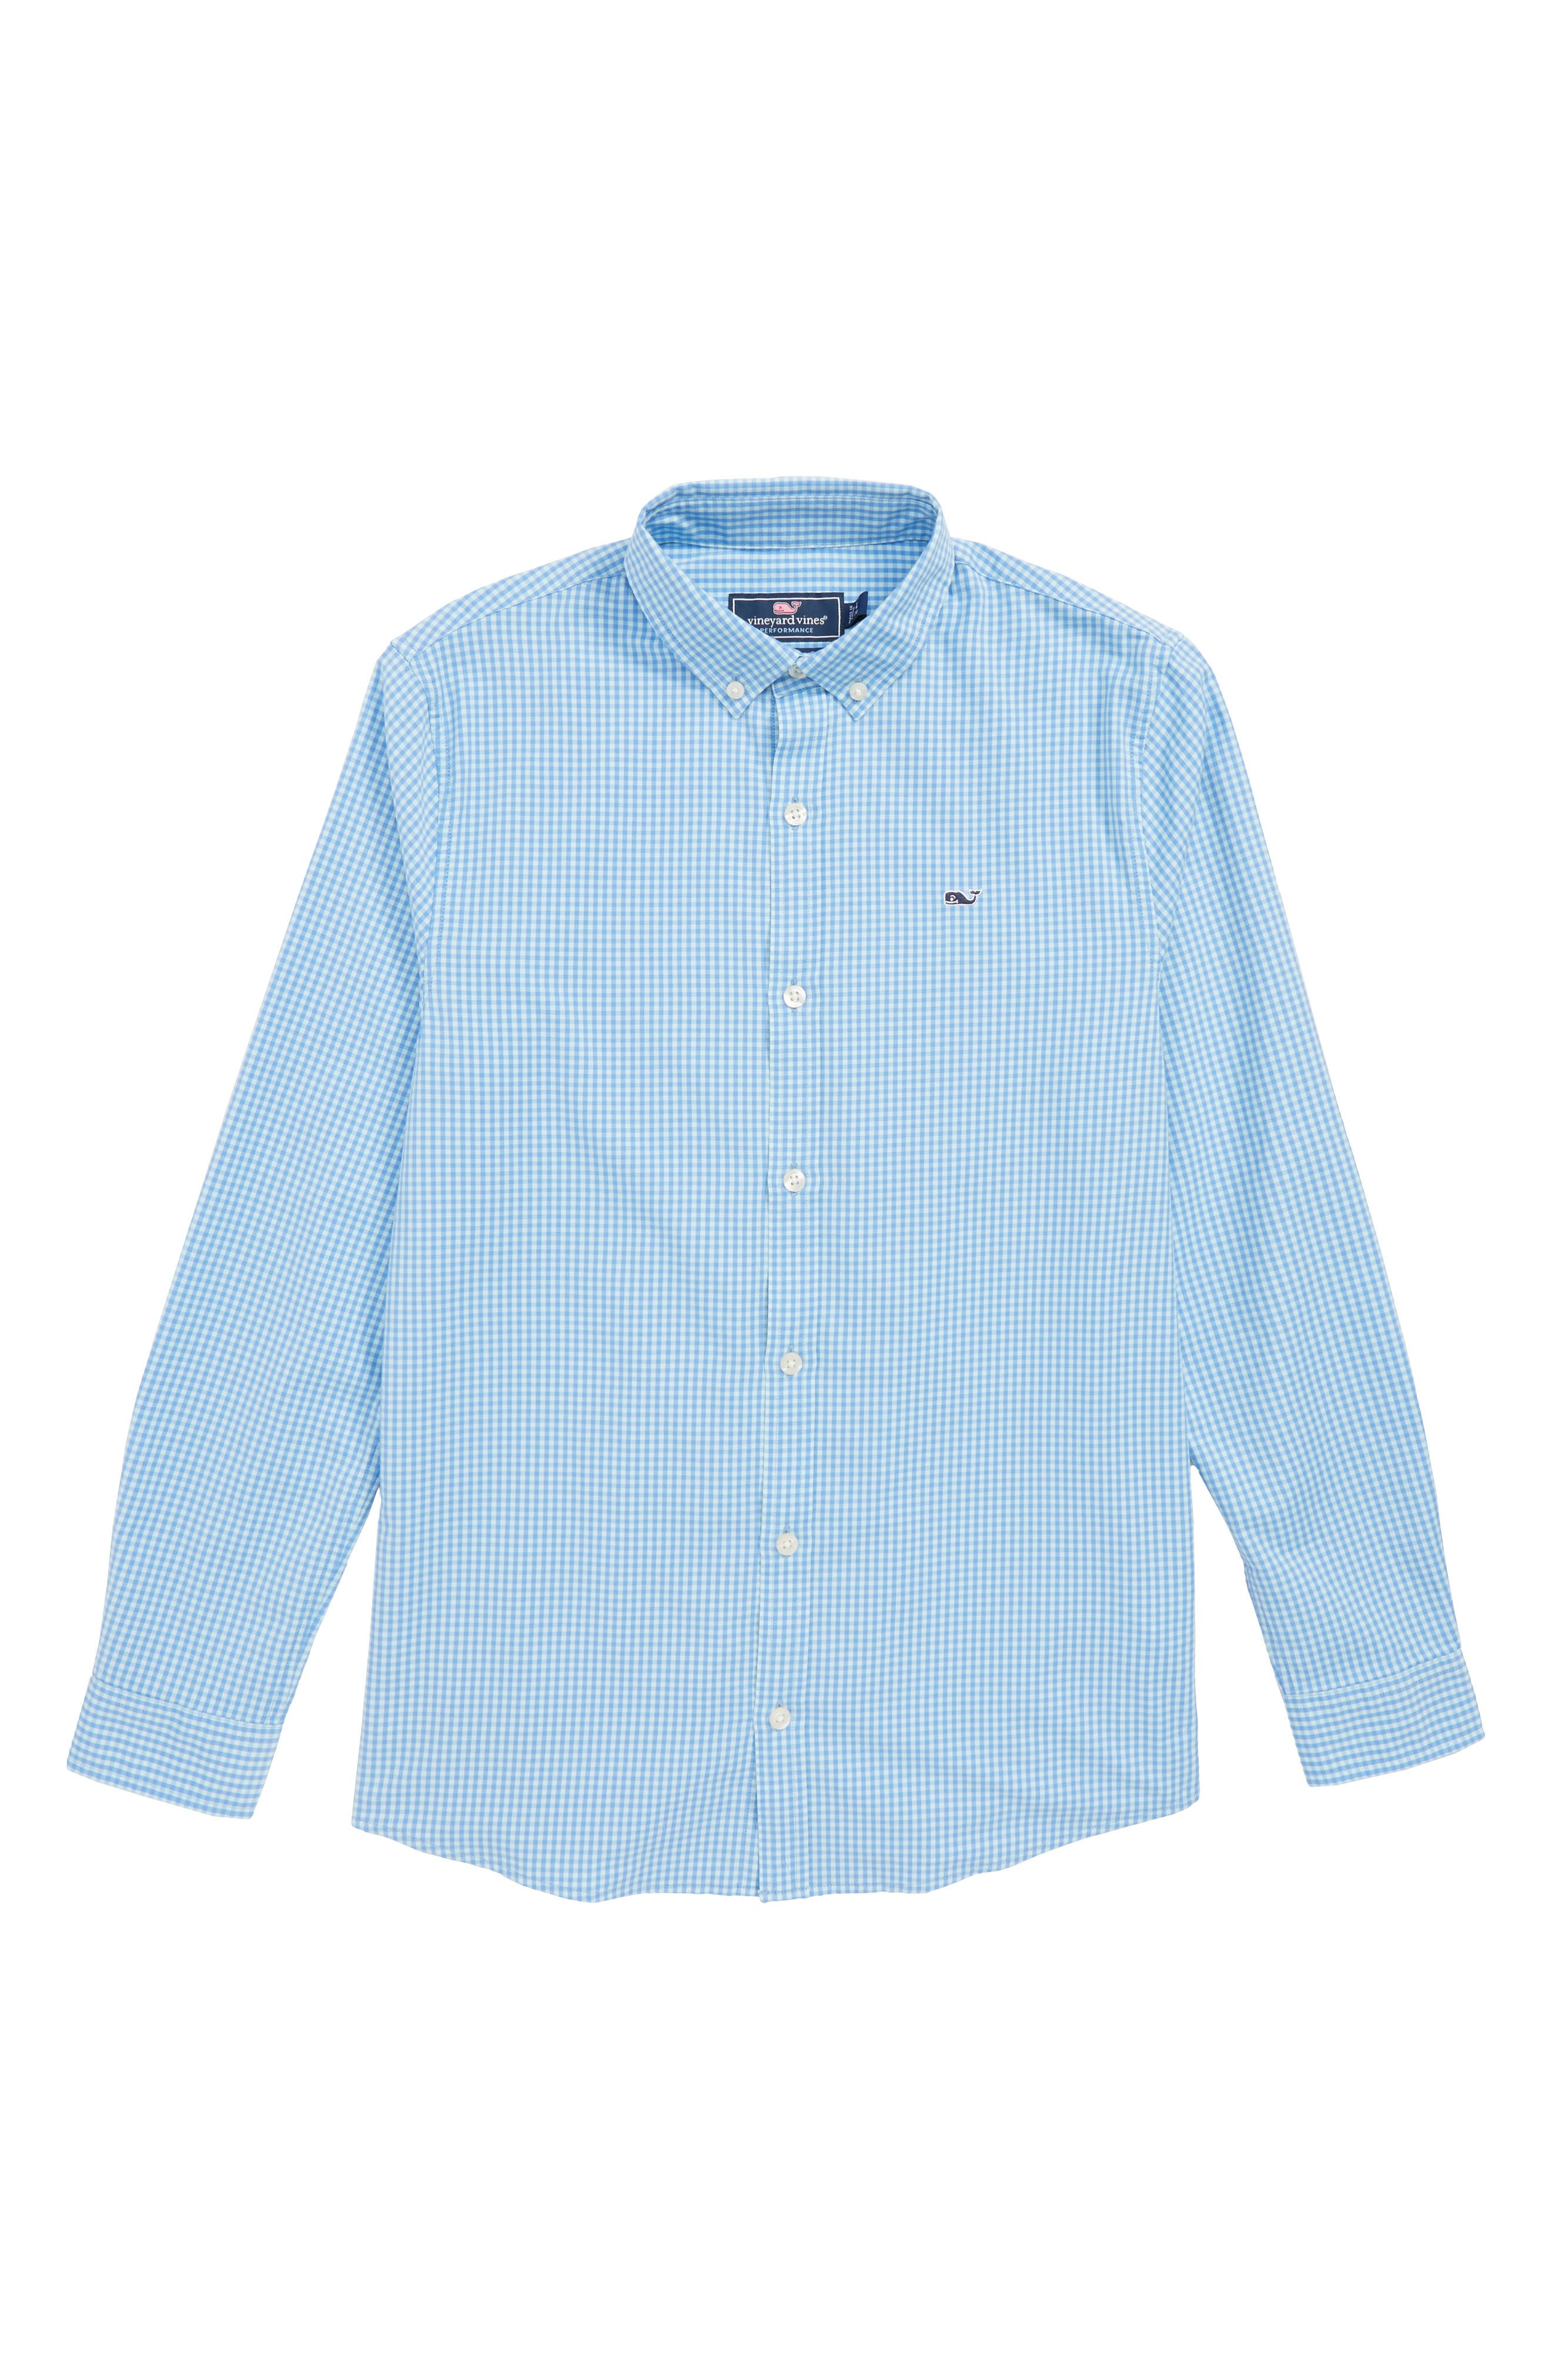 Mink Meadow Check Performance Sport Shirt,                             Main thumbnail 1, color,                             400